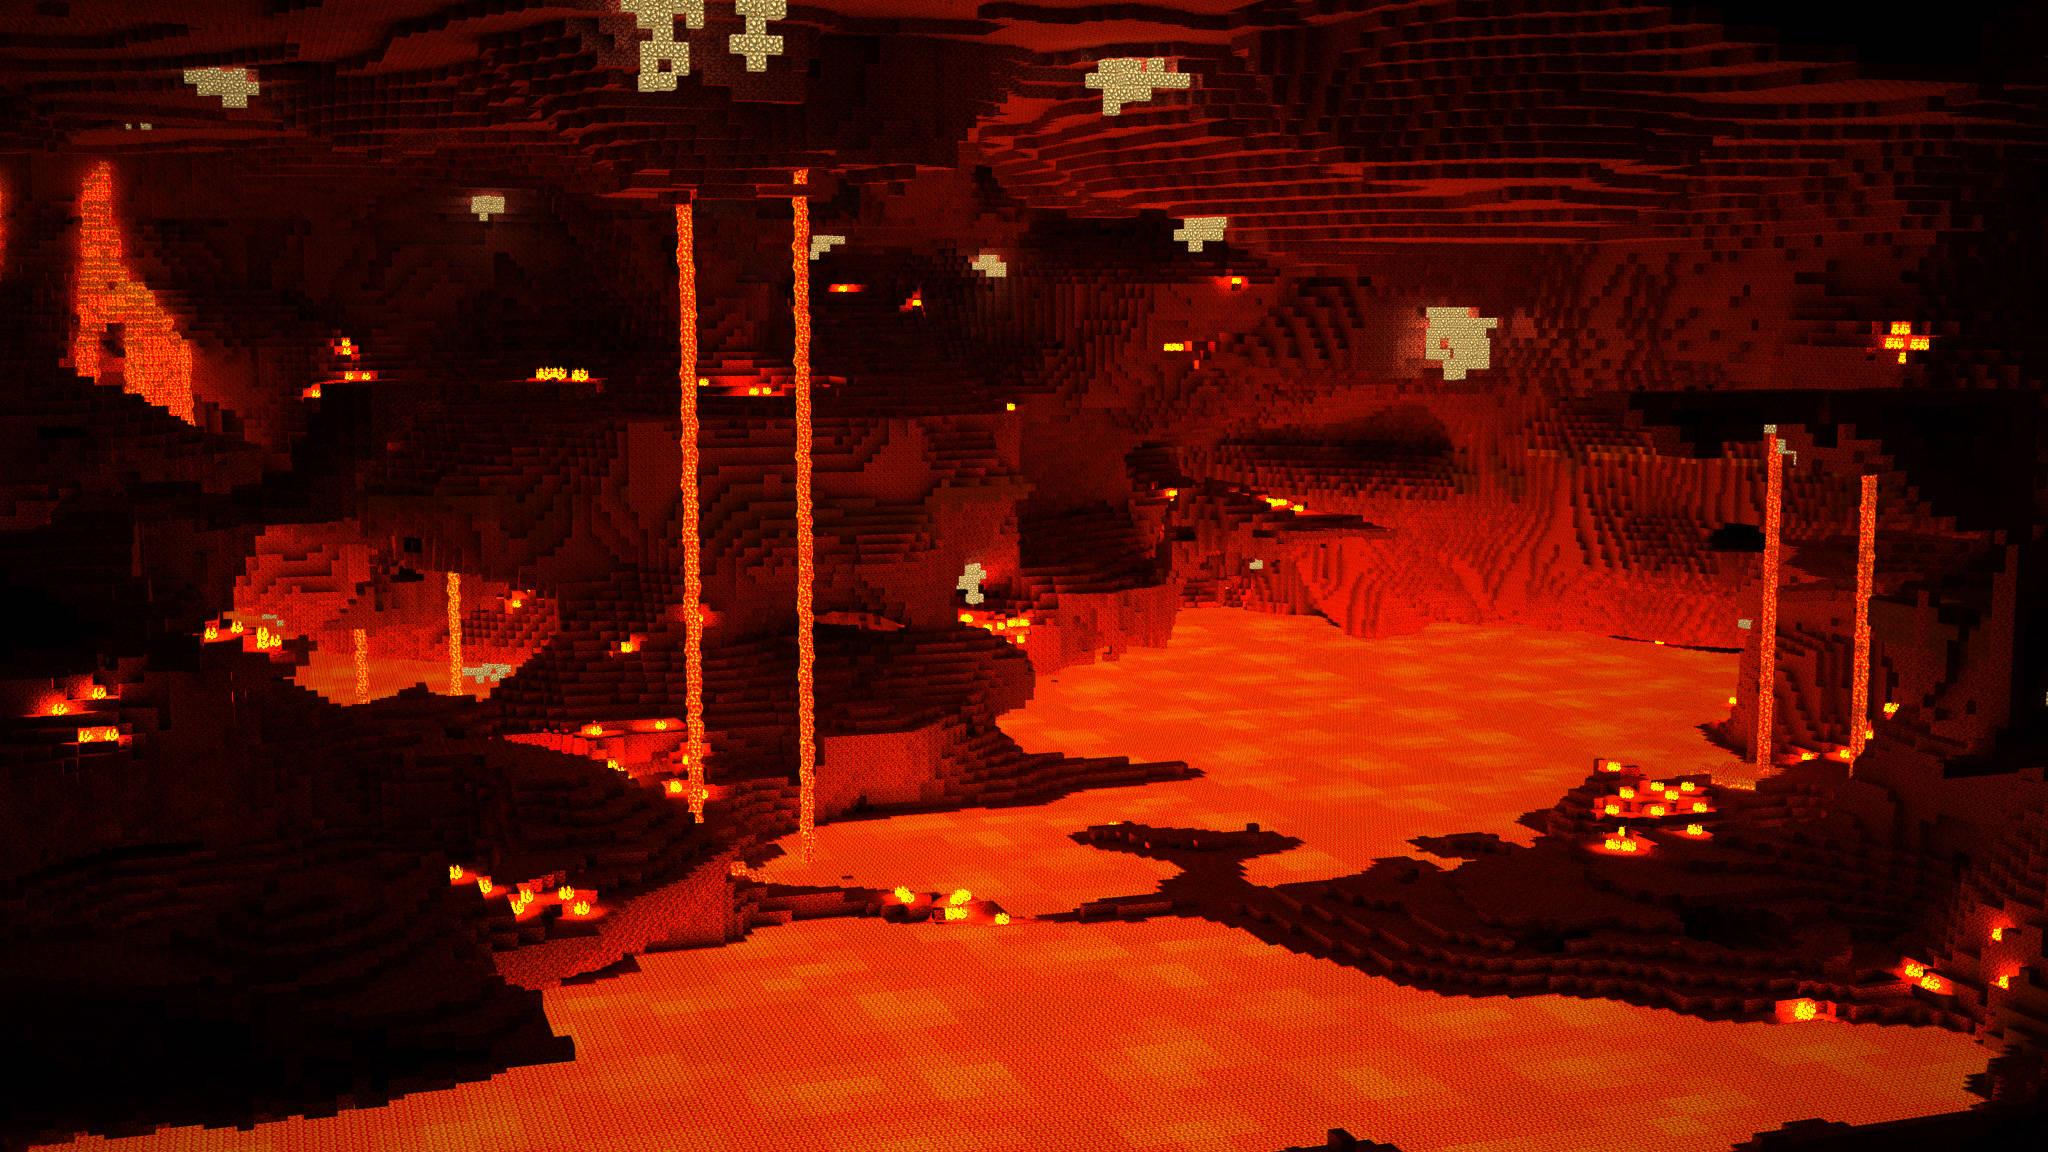 Lava Minecraft 20481152 Wallpaper 1611568 2048x1152